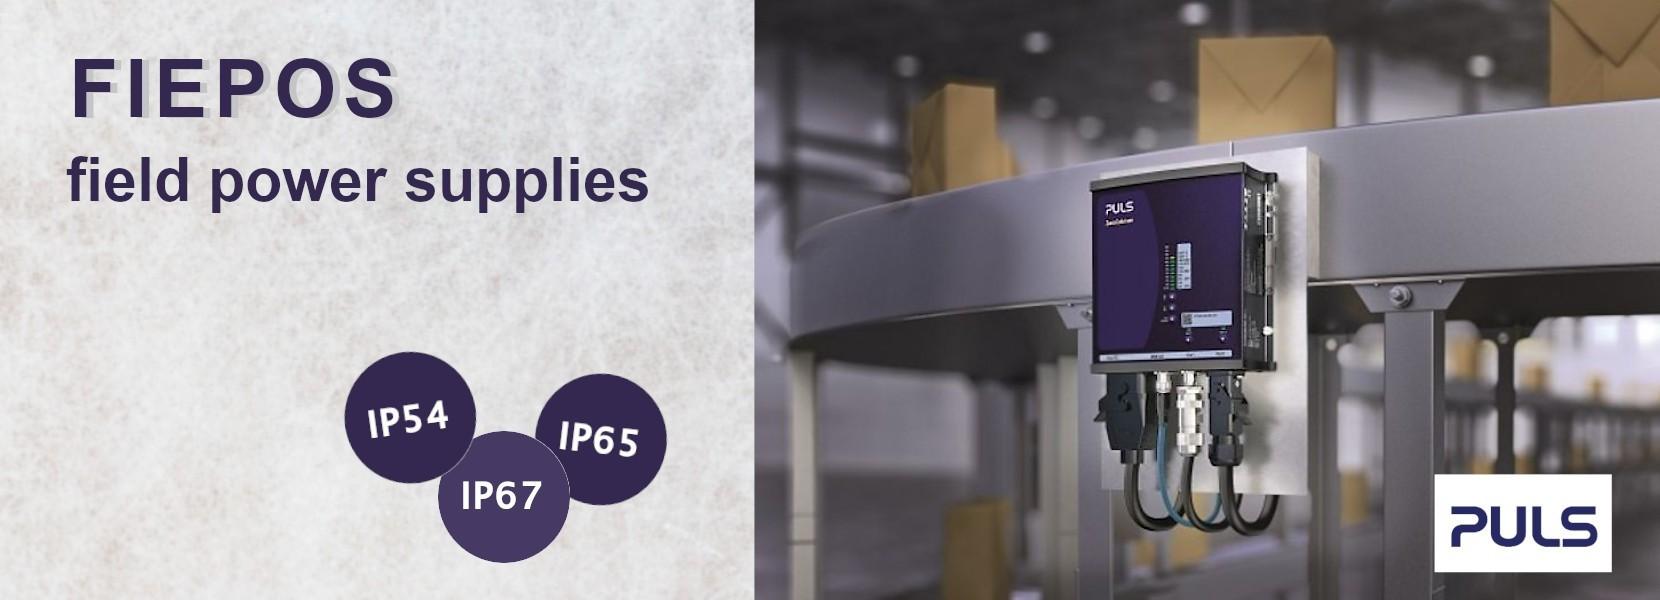 FIEPOS – IP54, IP65 and IP67 field power supplies